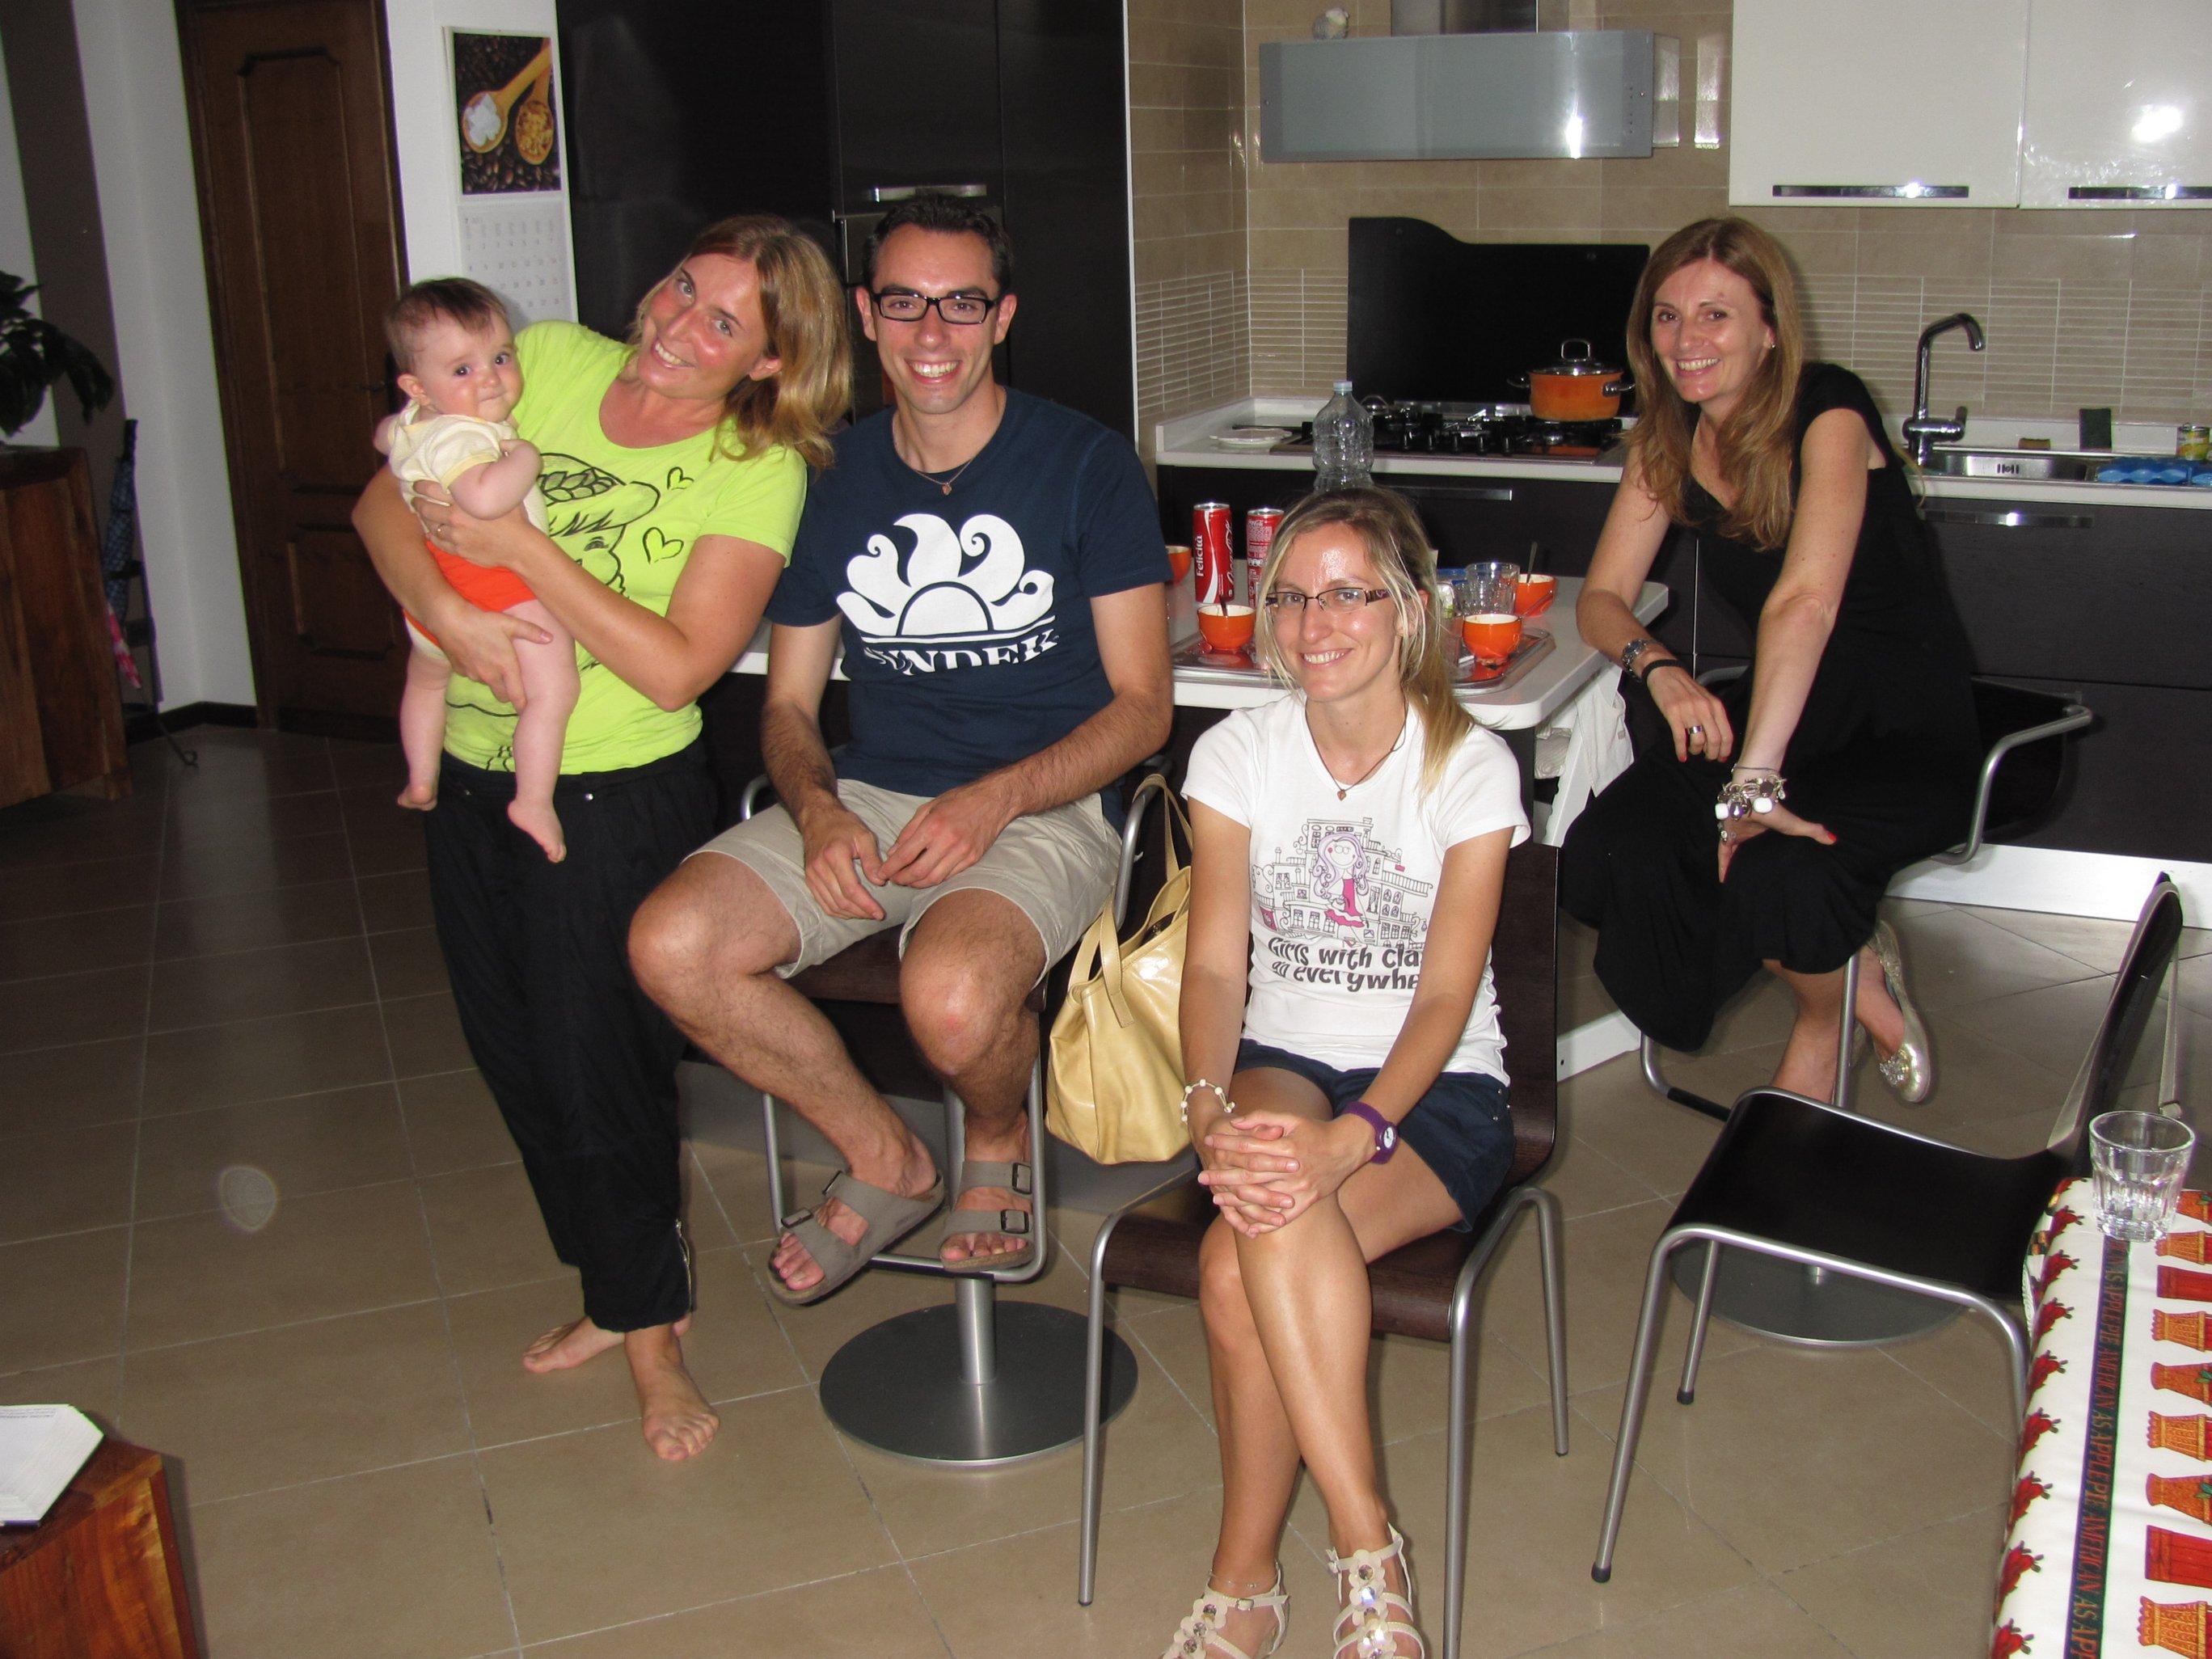 lara_elena_fabrizio_tiziana_2013-07-17-19-32-14